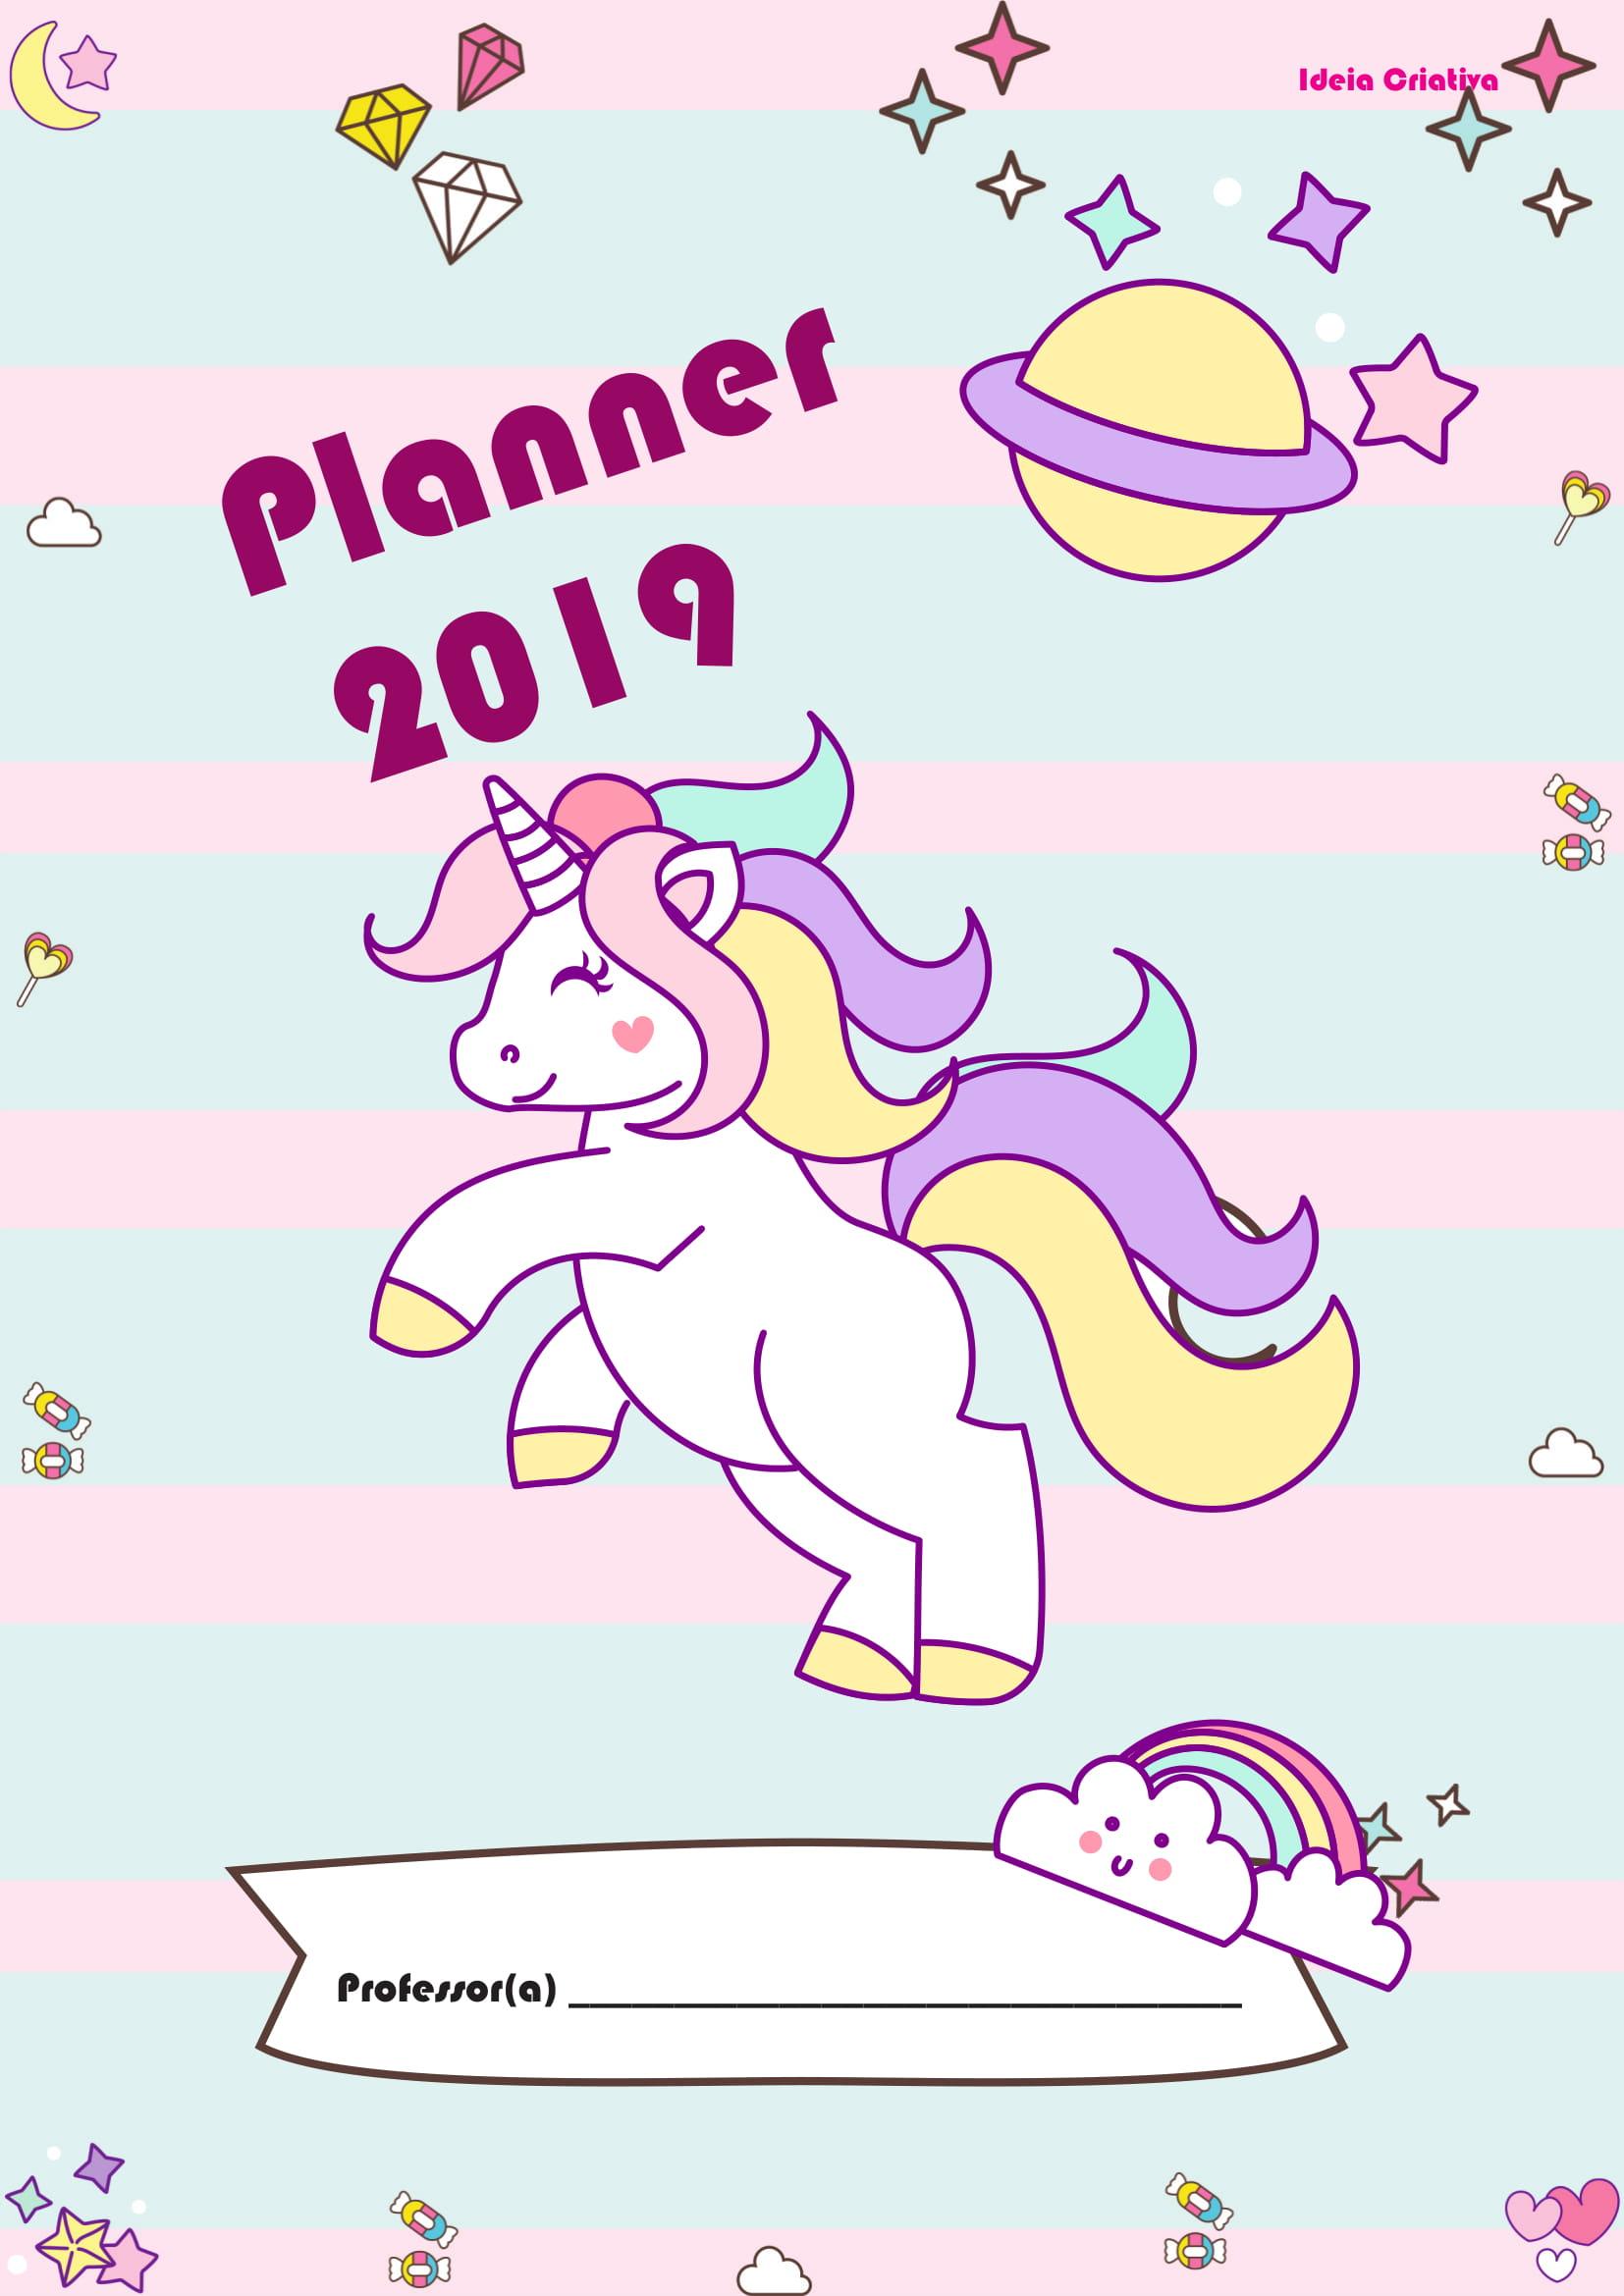 planner-2019-personalizado-para-baixar-e-imprimir-grati-download-free-professor (1)